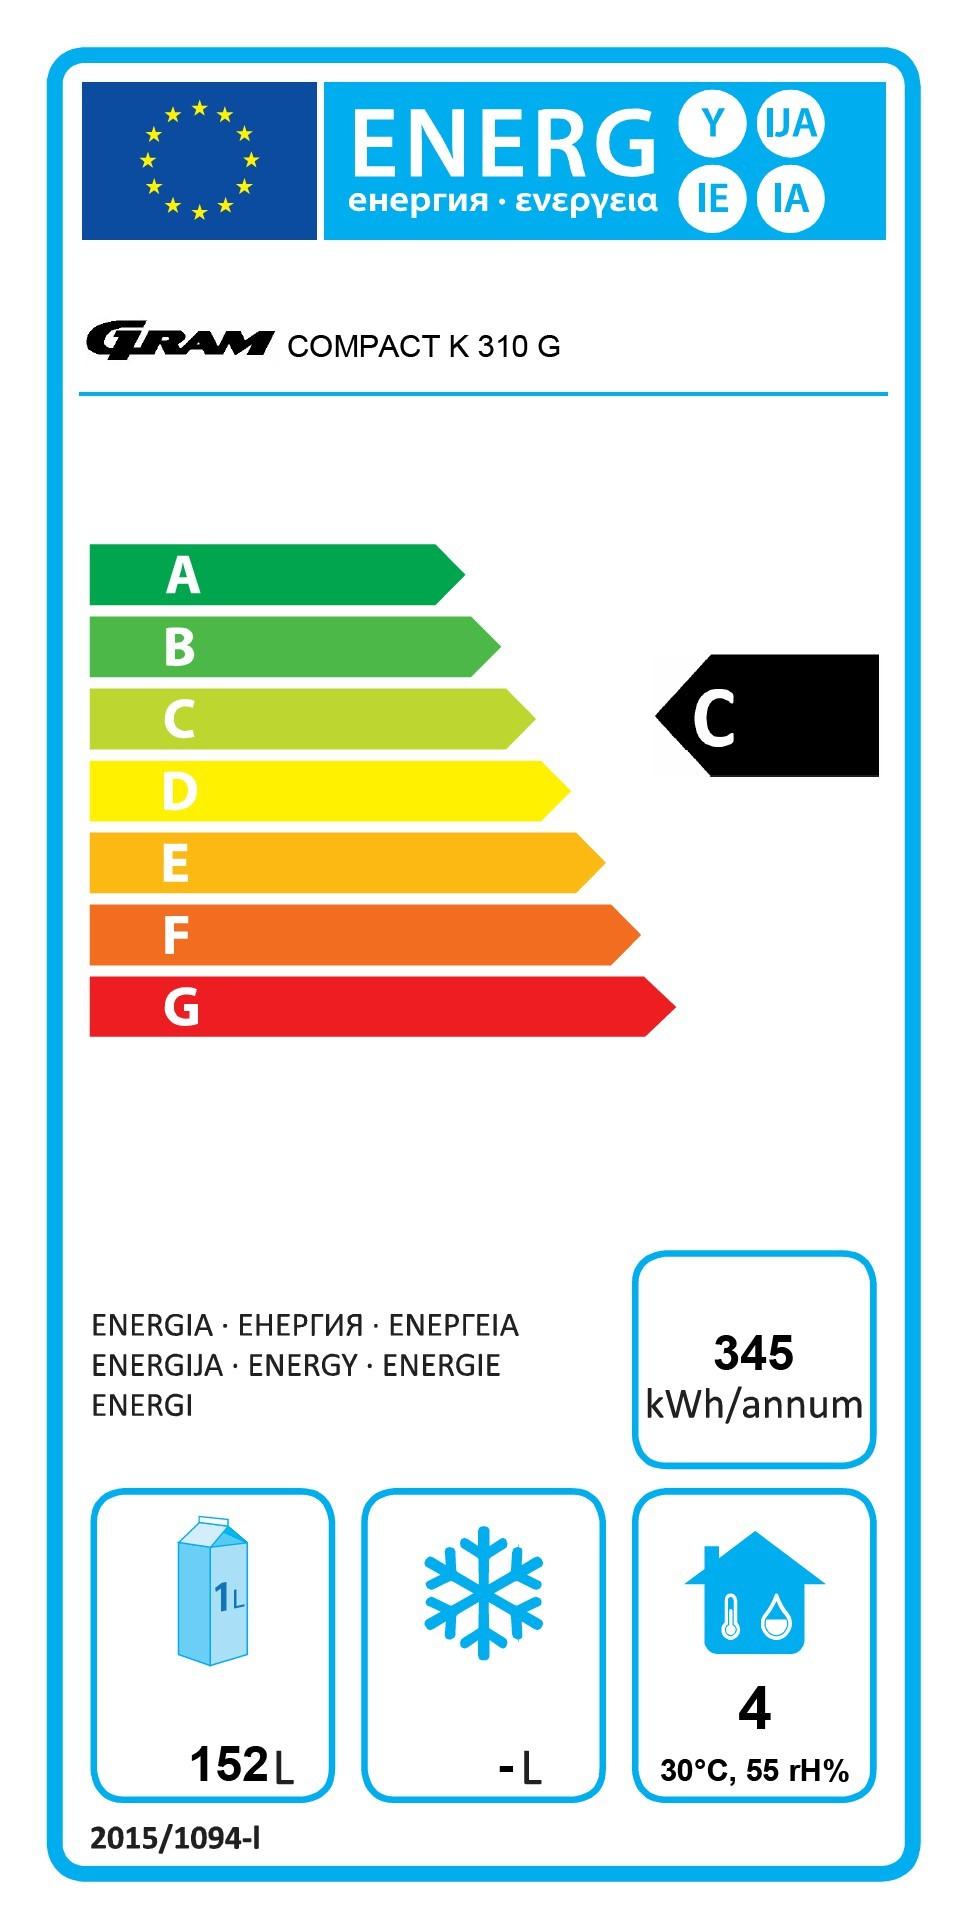 COMPACT KG 310 RG C 4W 218 Ltr Glass Door Display Fridge Energy Rating